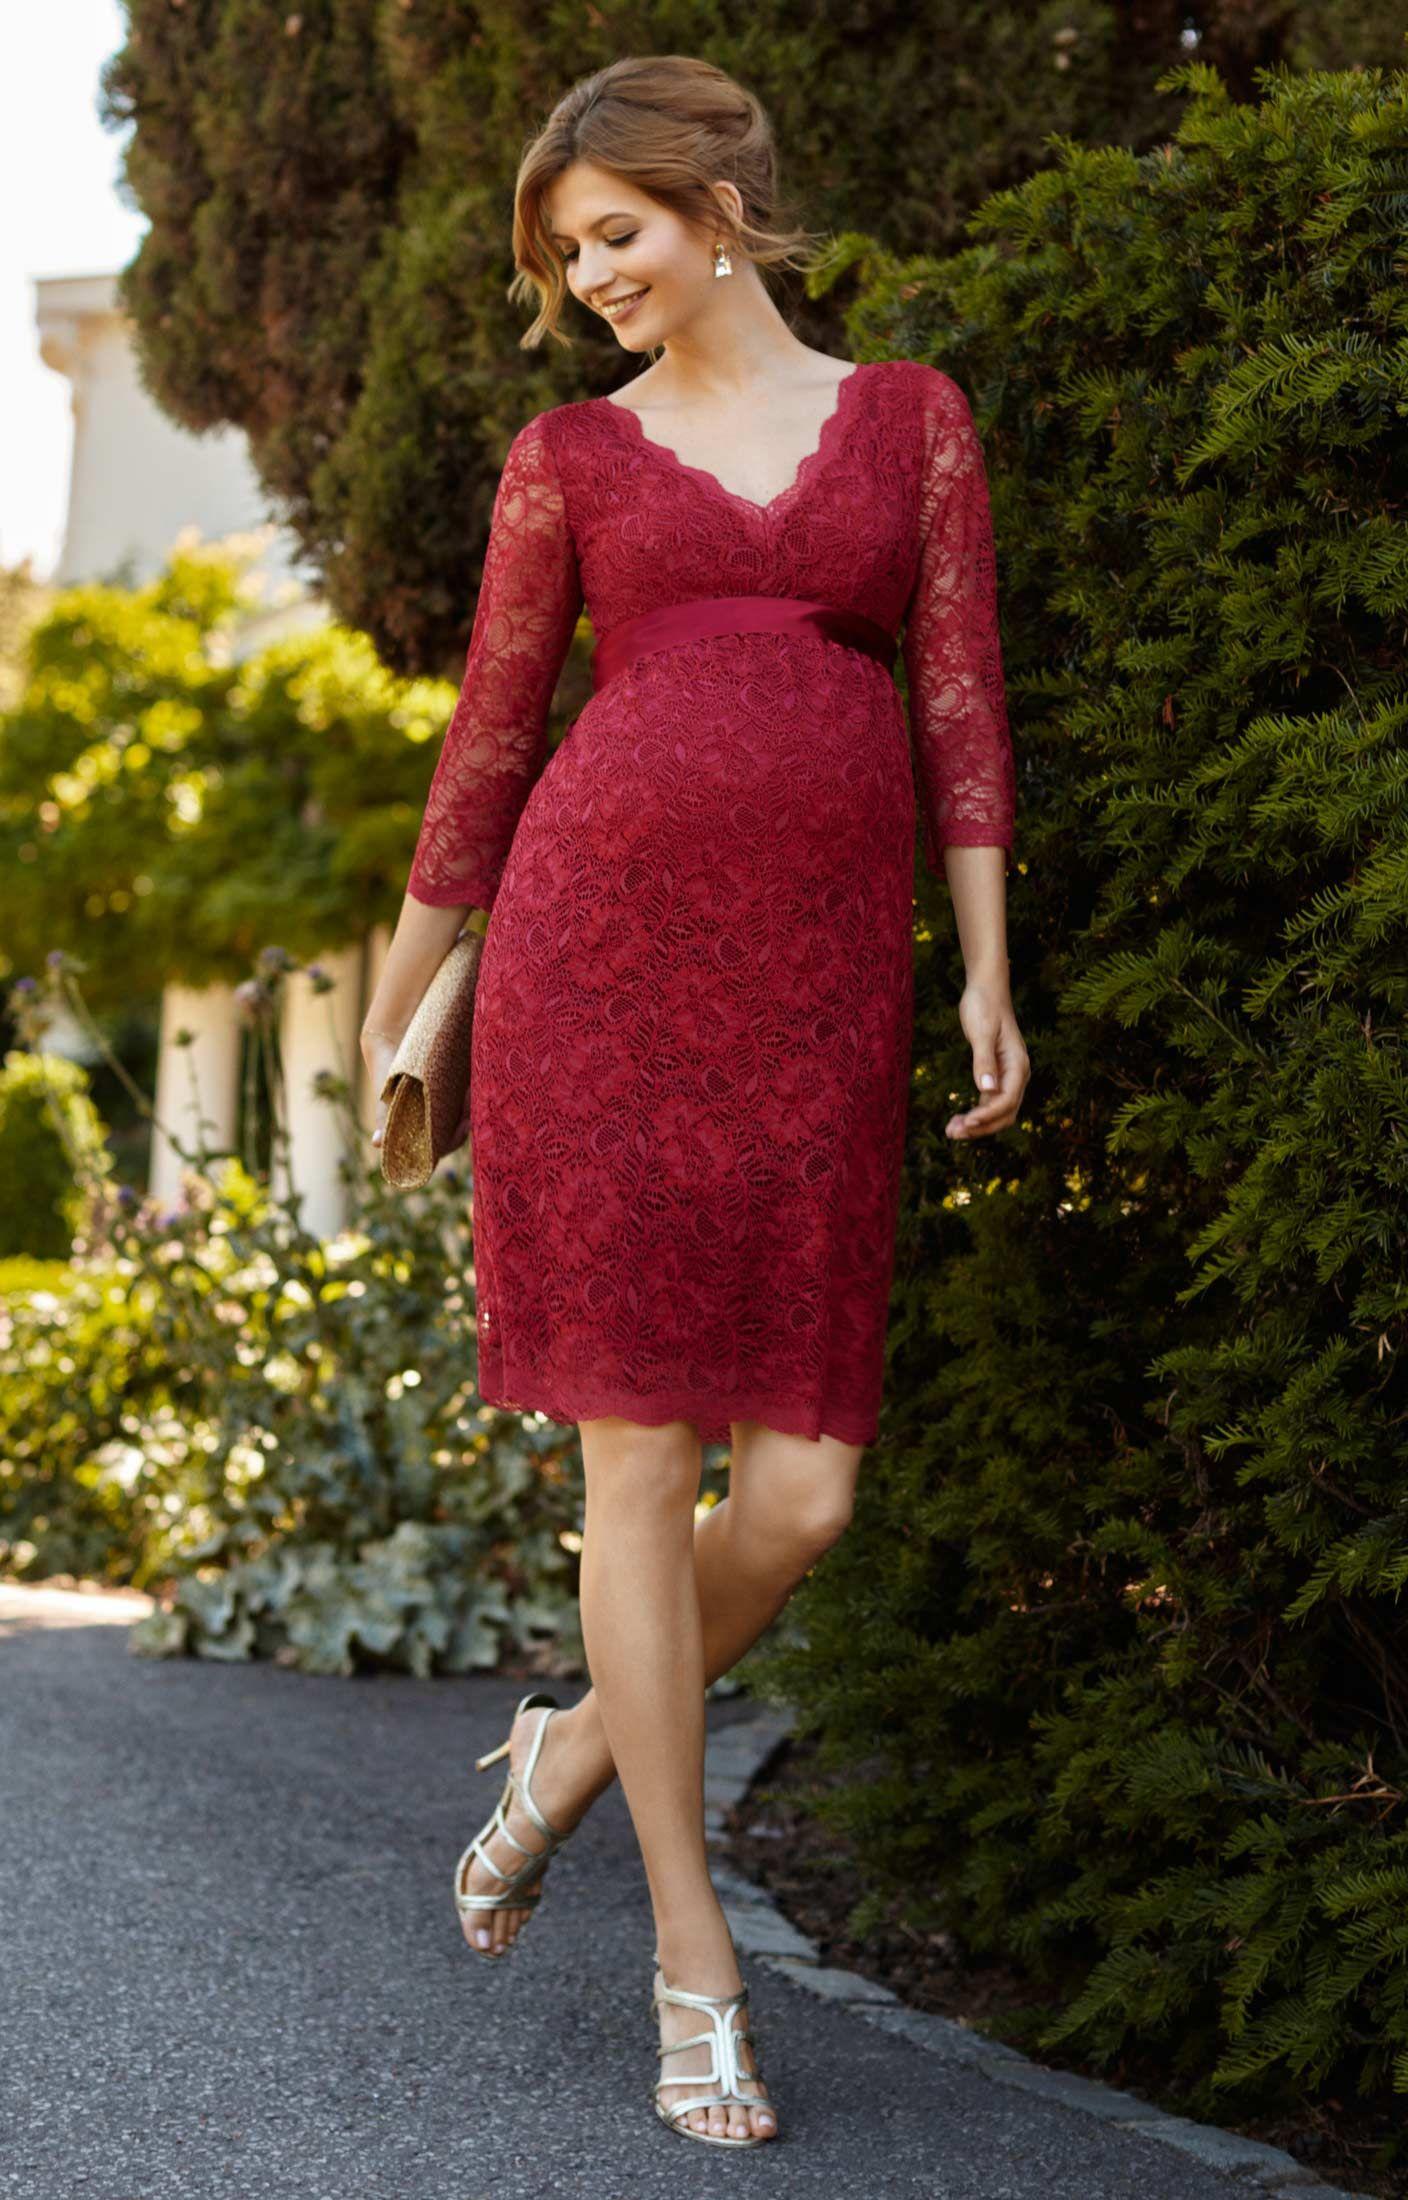 Wedding dress rental los angeles  M s red lace dress maternity  Good style dresses  Pinterest